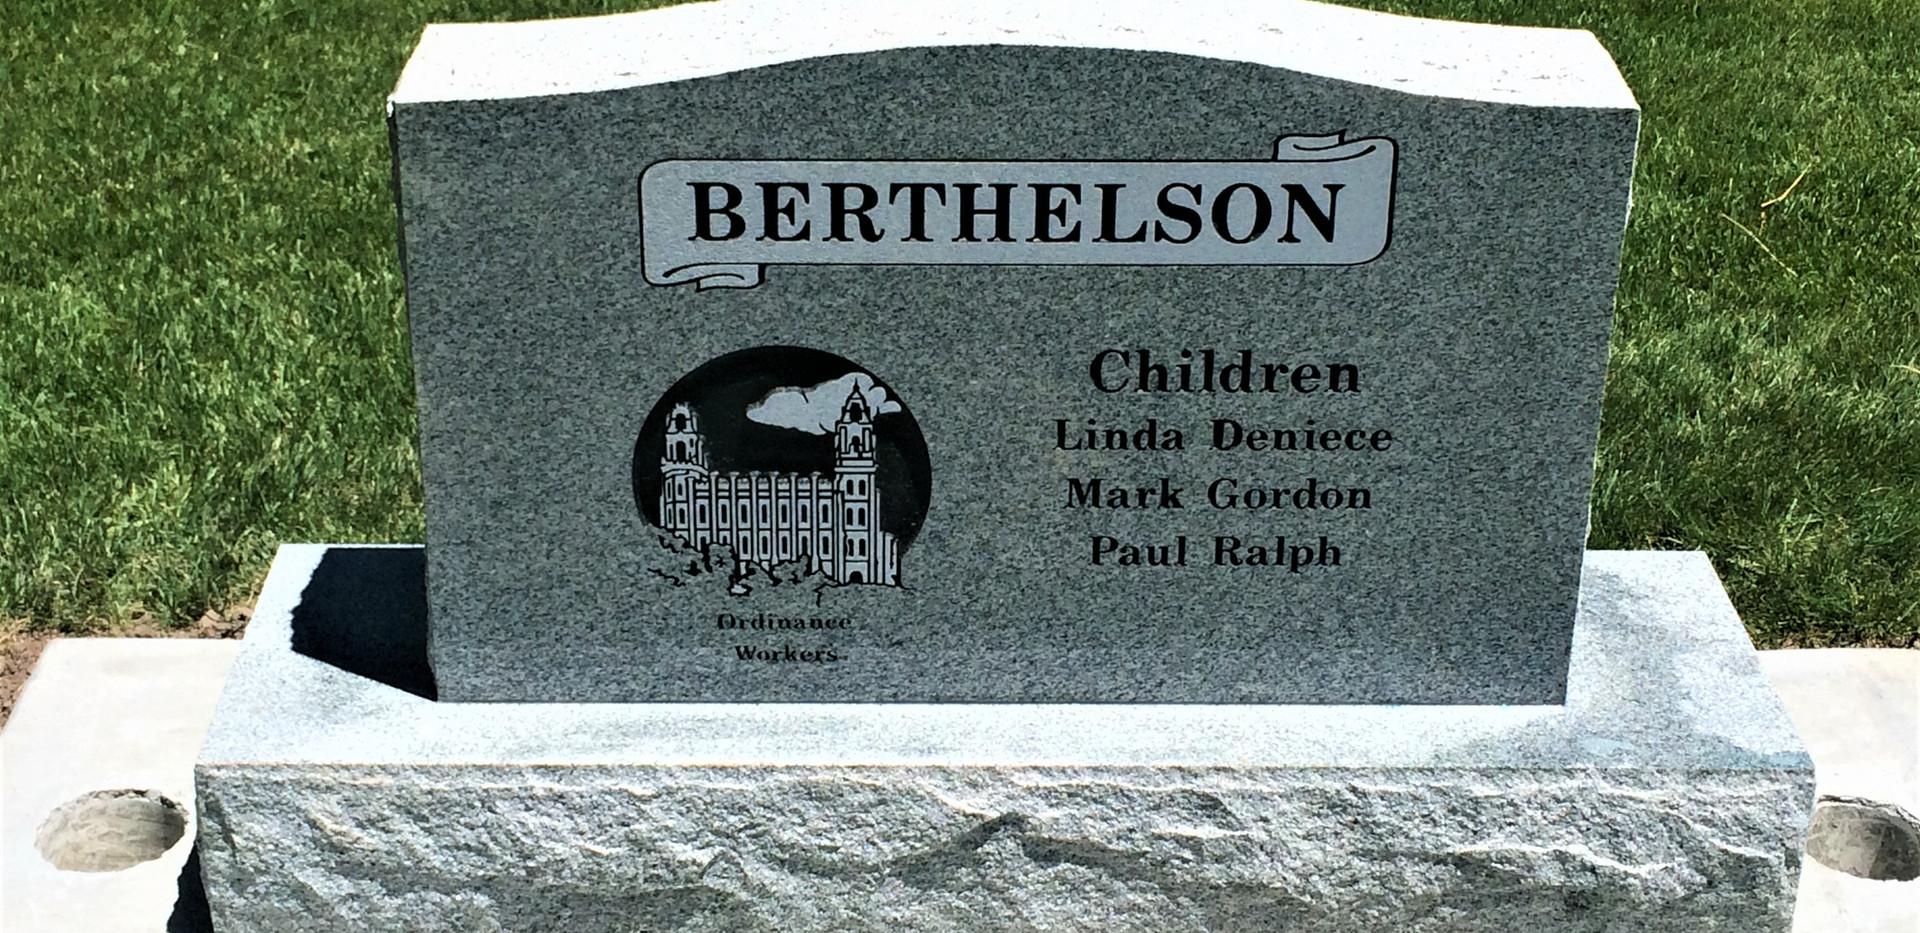 Berthelson Back upright .jpg